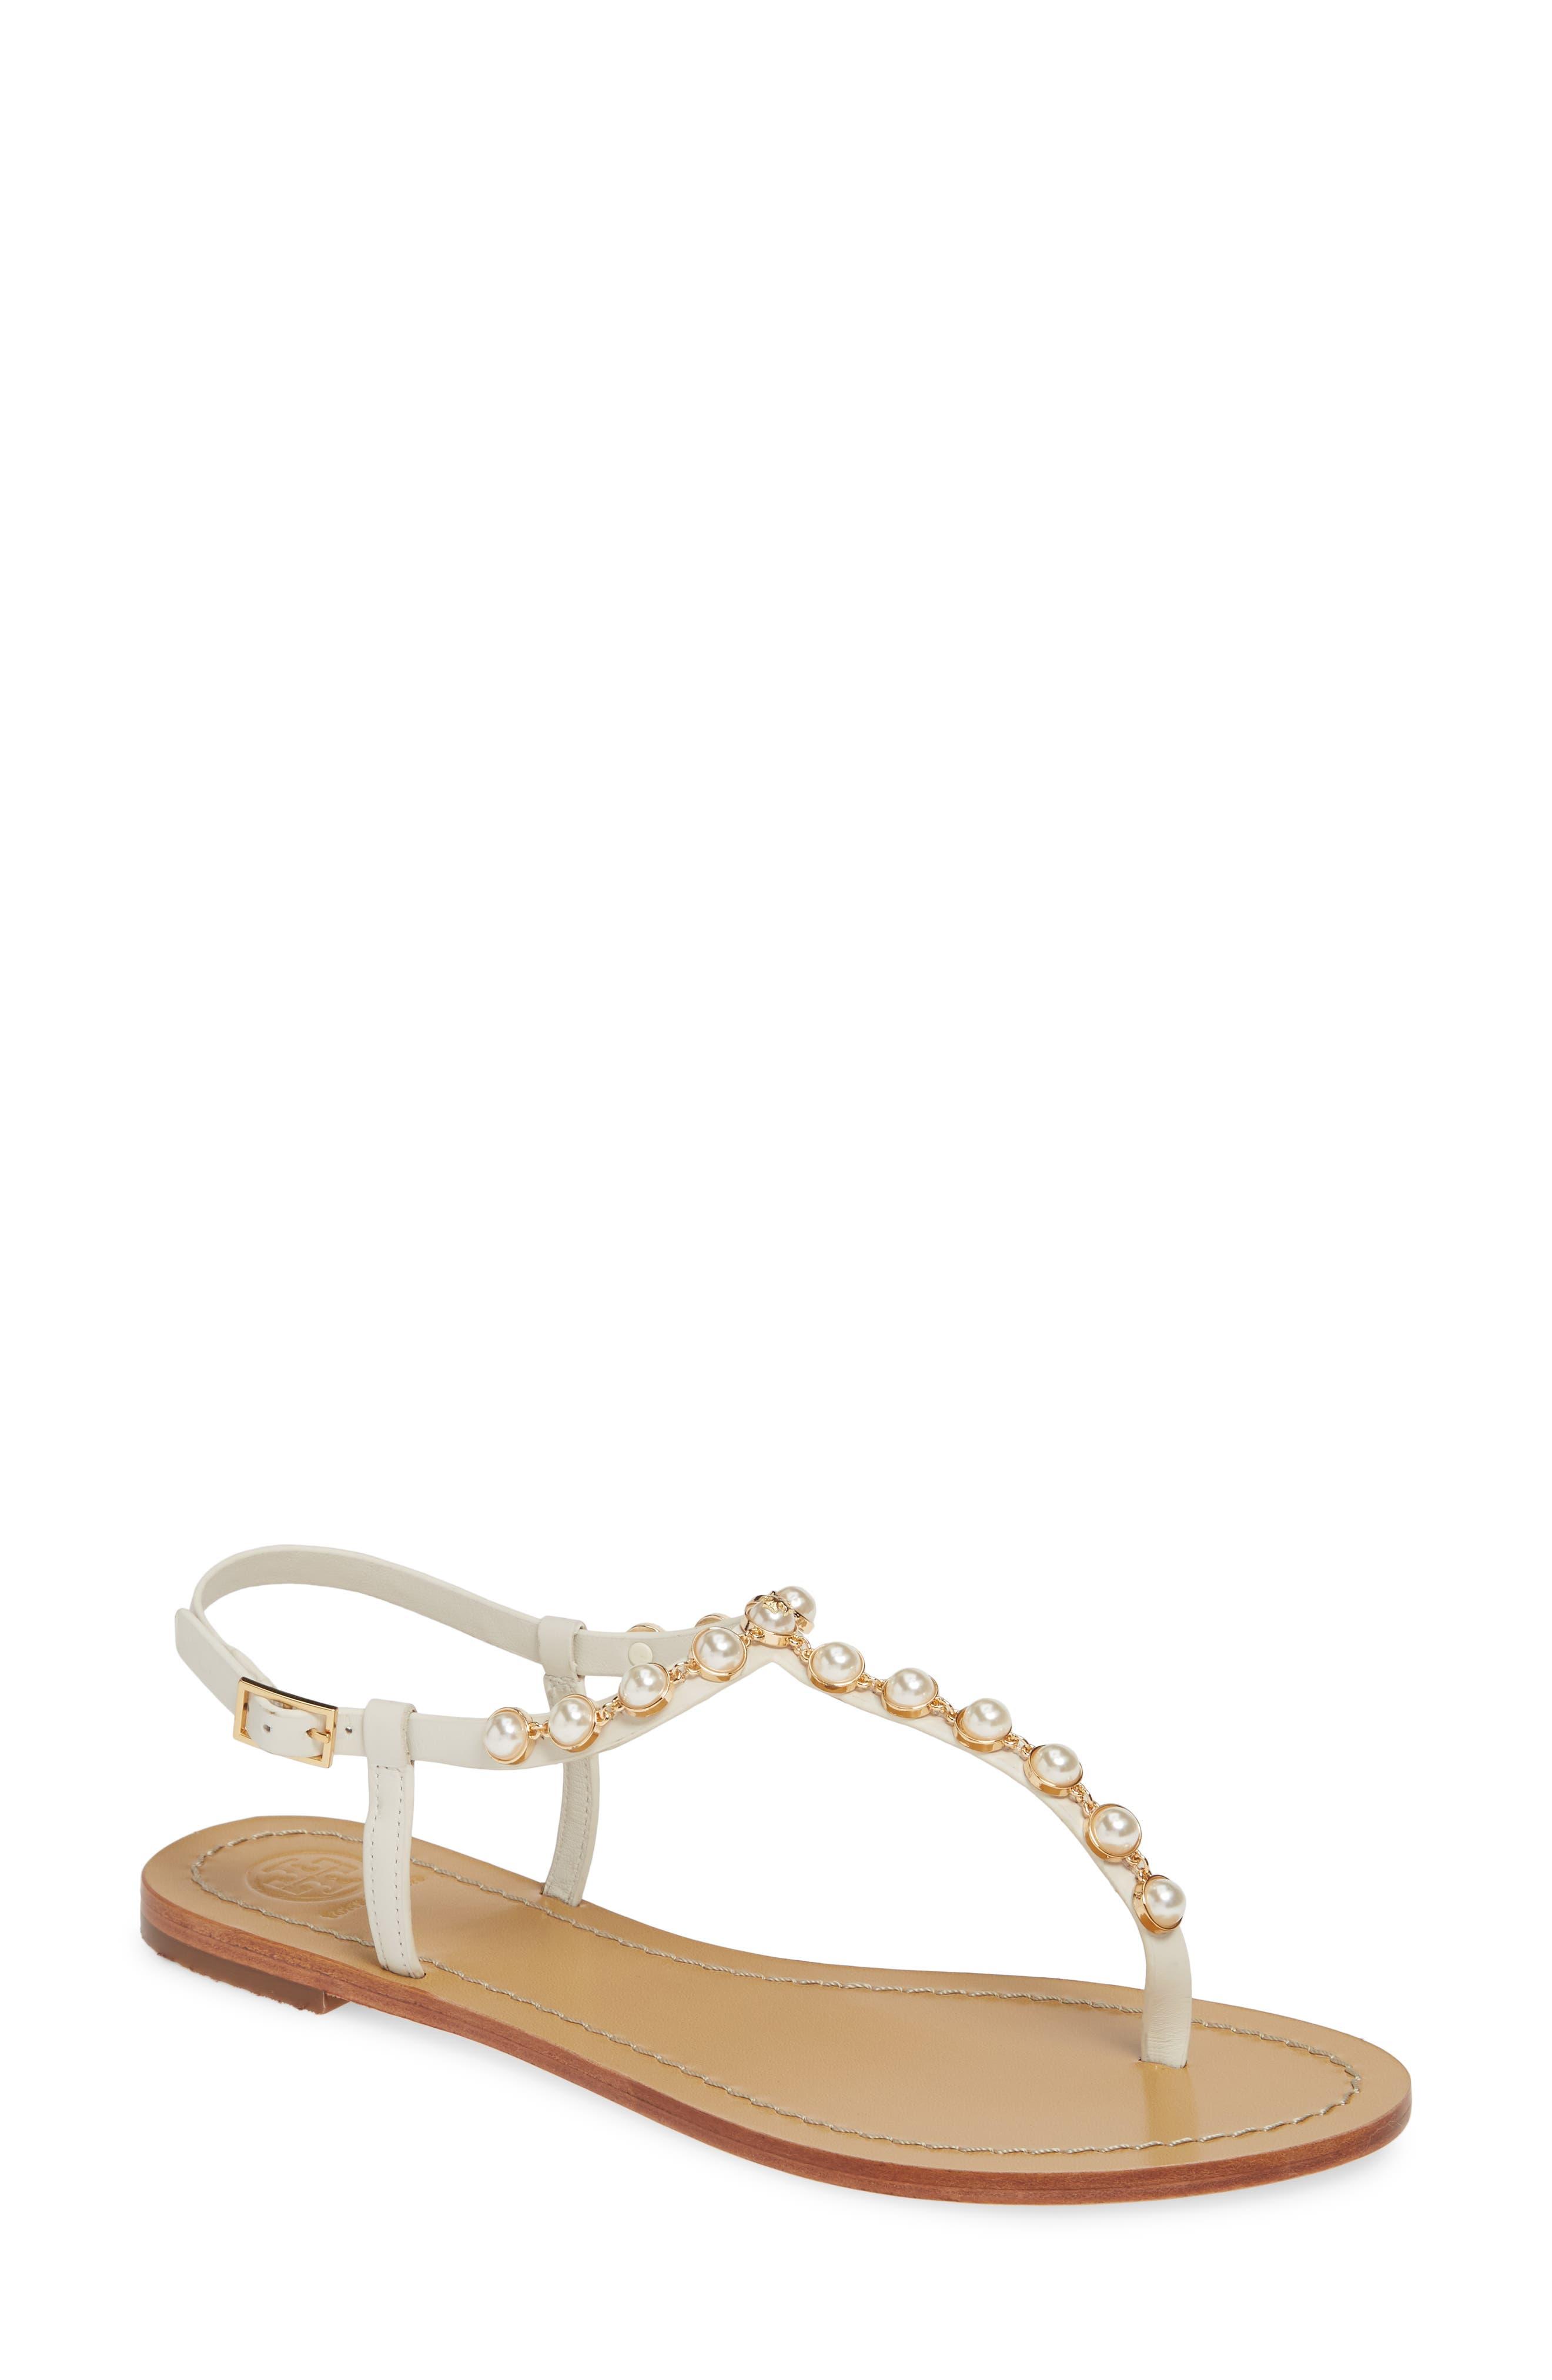 Tory Burch Emmy Embellished T-Strap Sandal, White